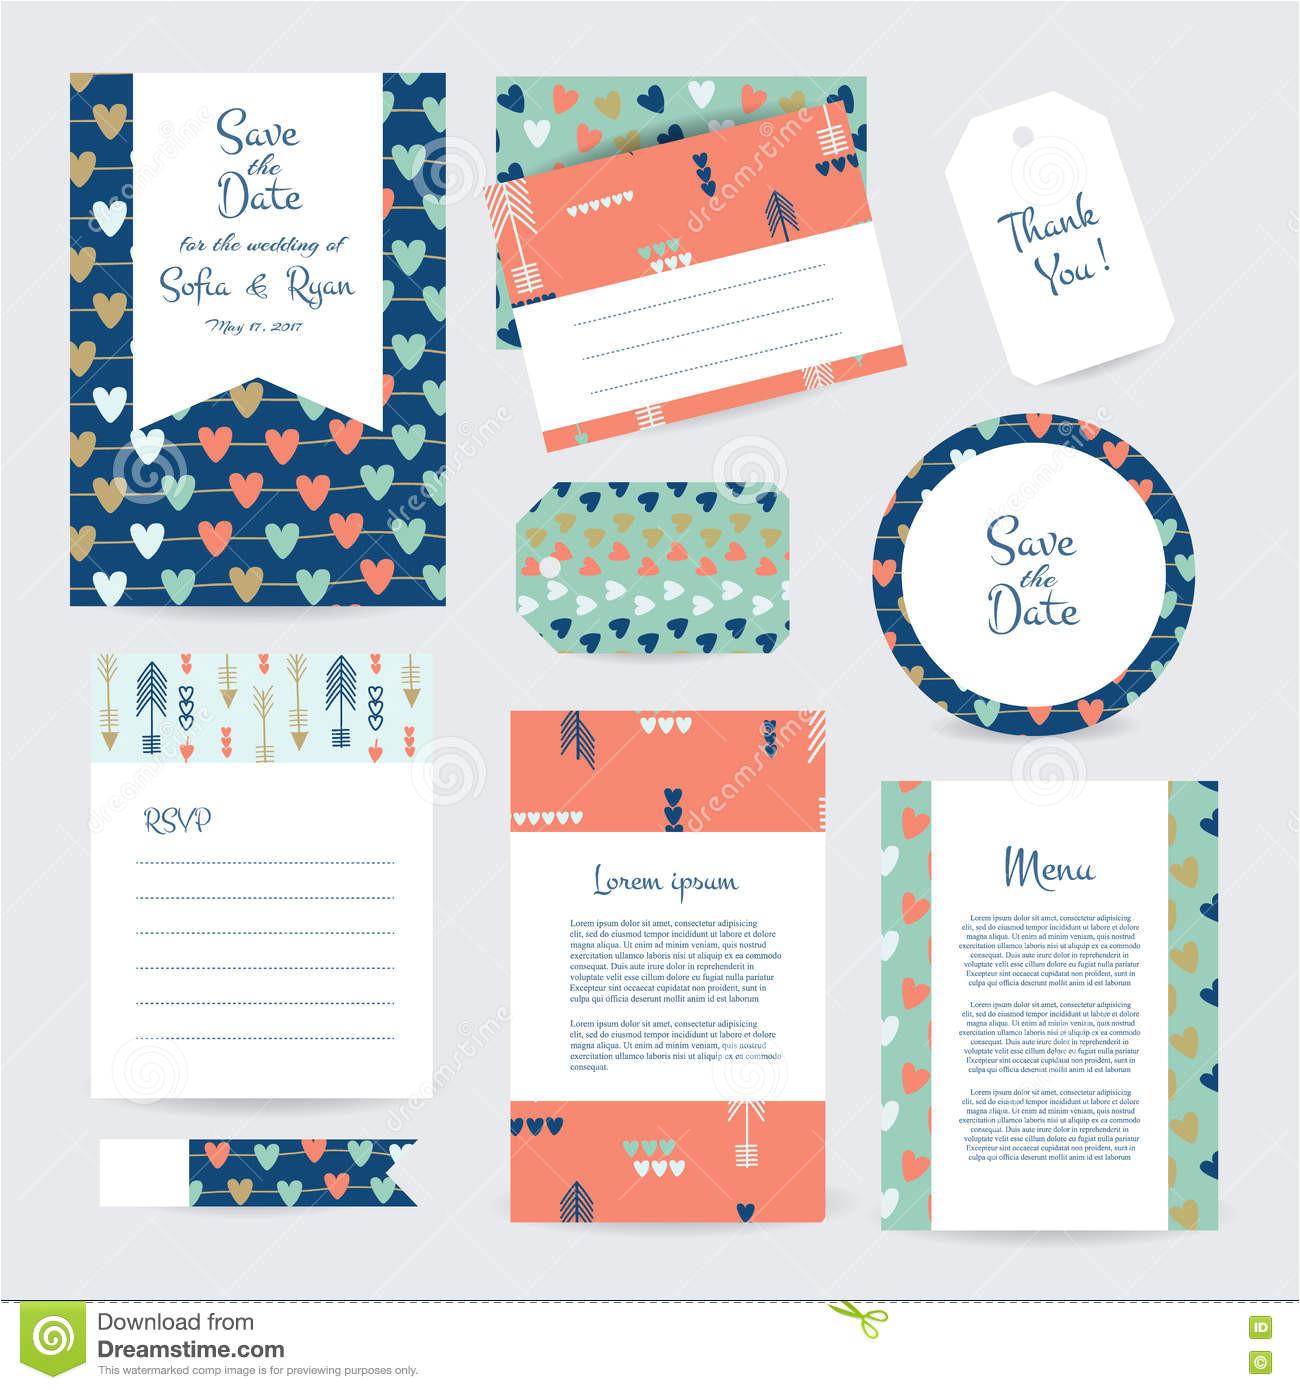 cards template wedding vector gentle hipster ethno design invitation save date rsvp menu thank you card 79168981 jpg